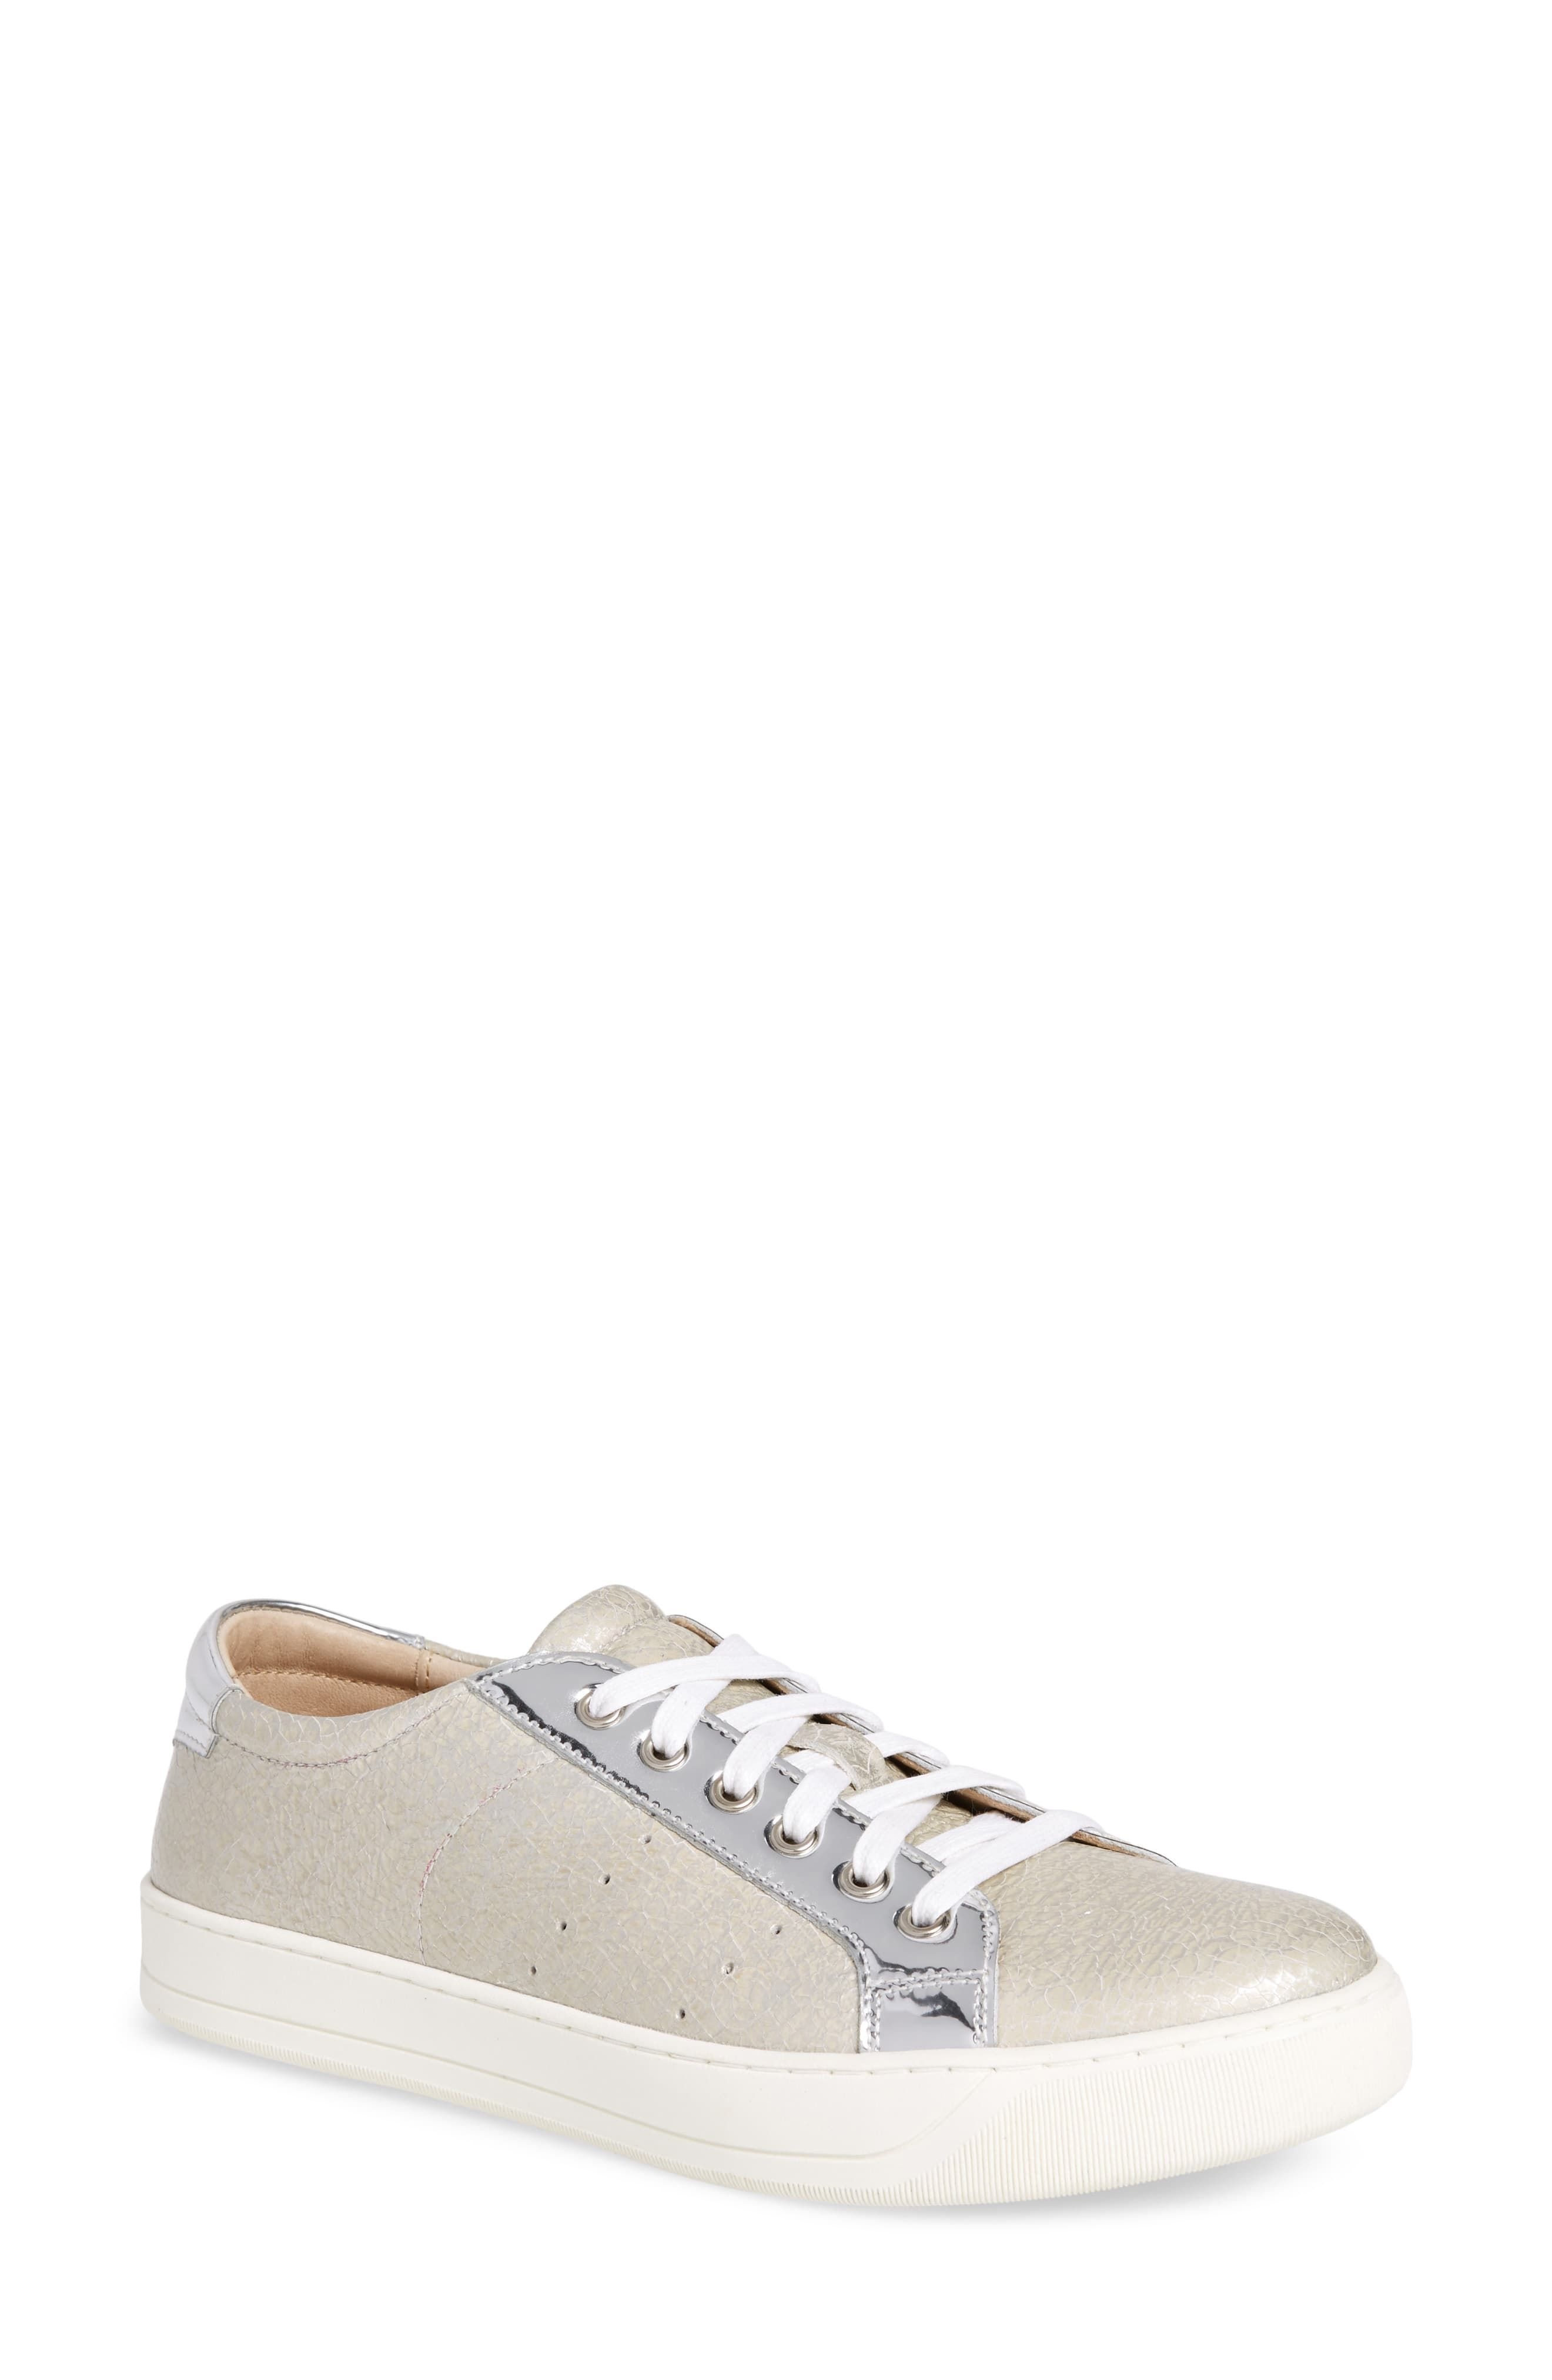 Sneakers, Johnston murphy, Leather sneakers